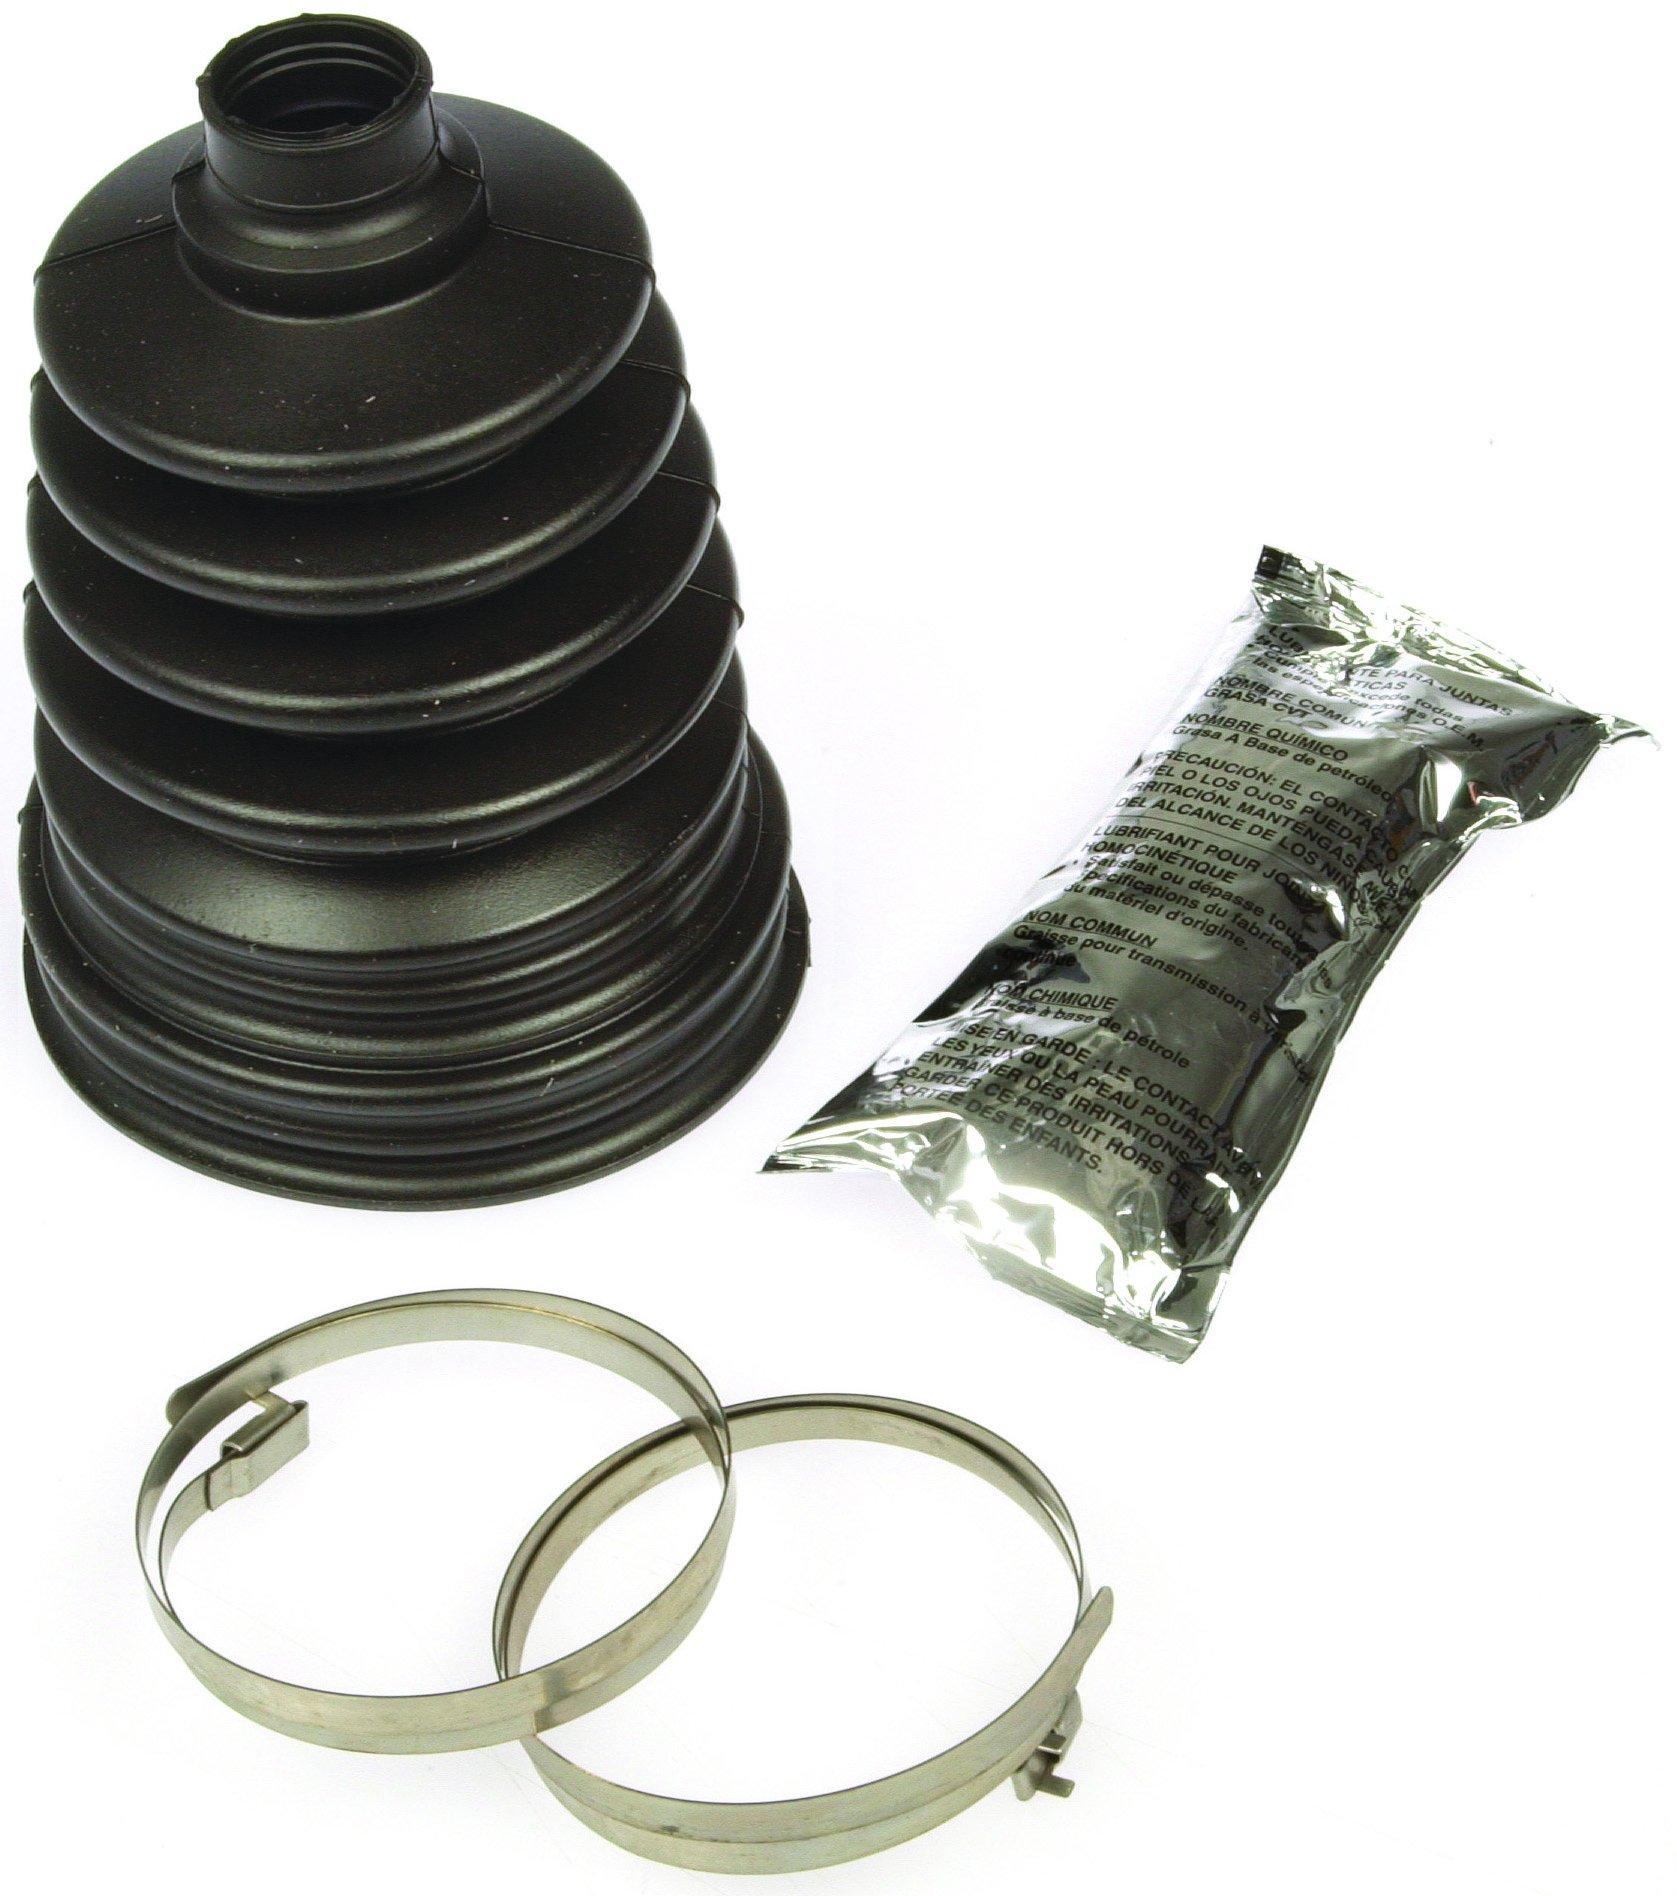 Dorman 614-003 HELP! Universal Fit CV Boot Kit